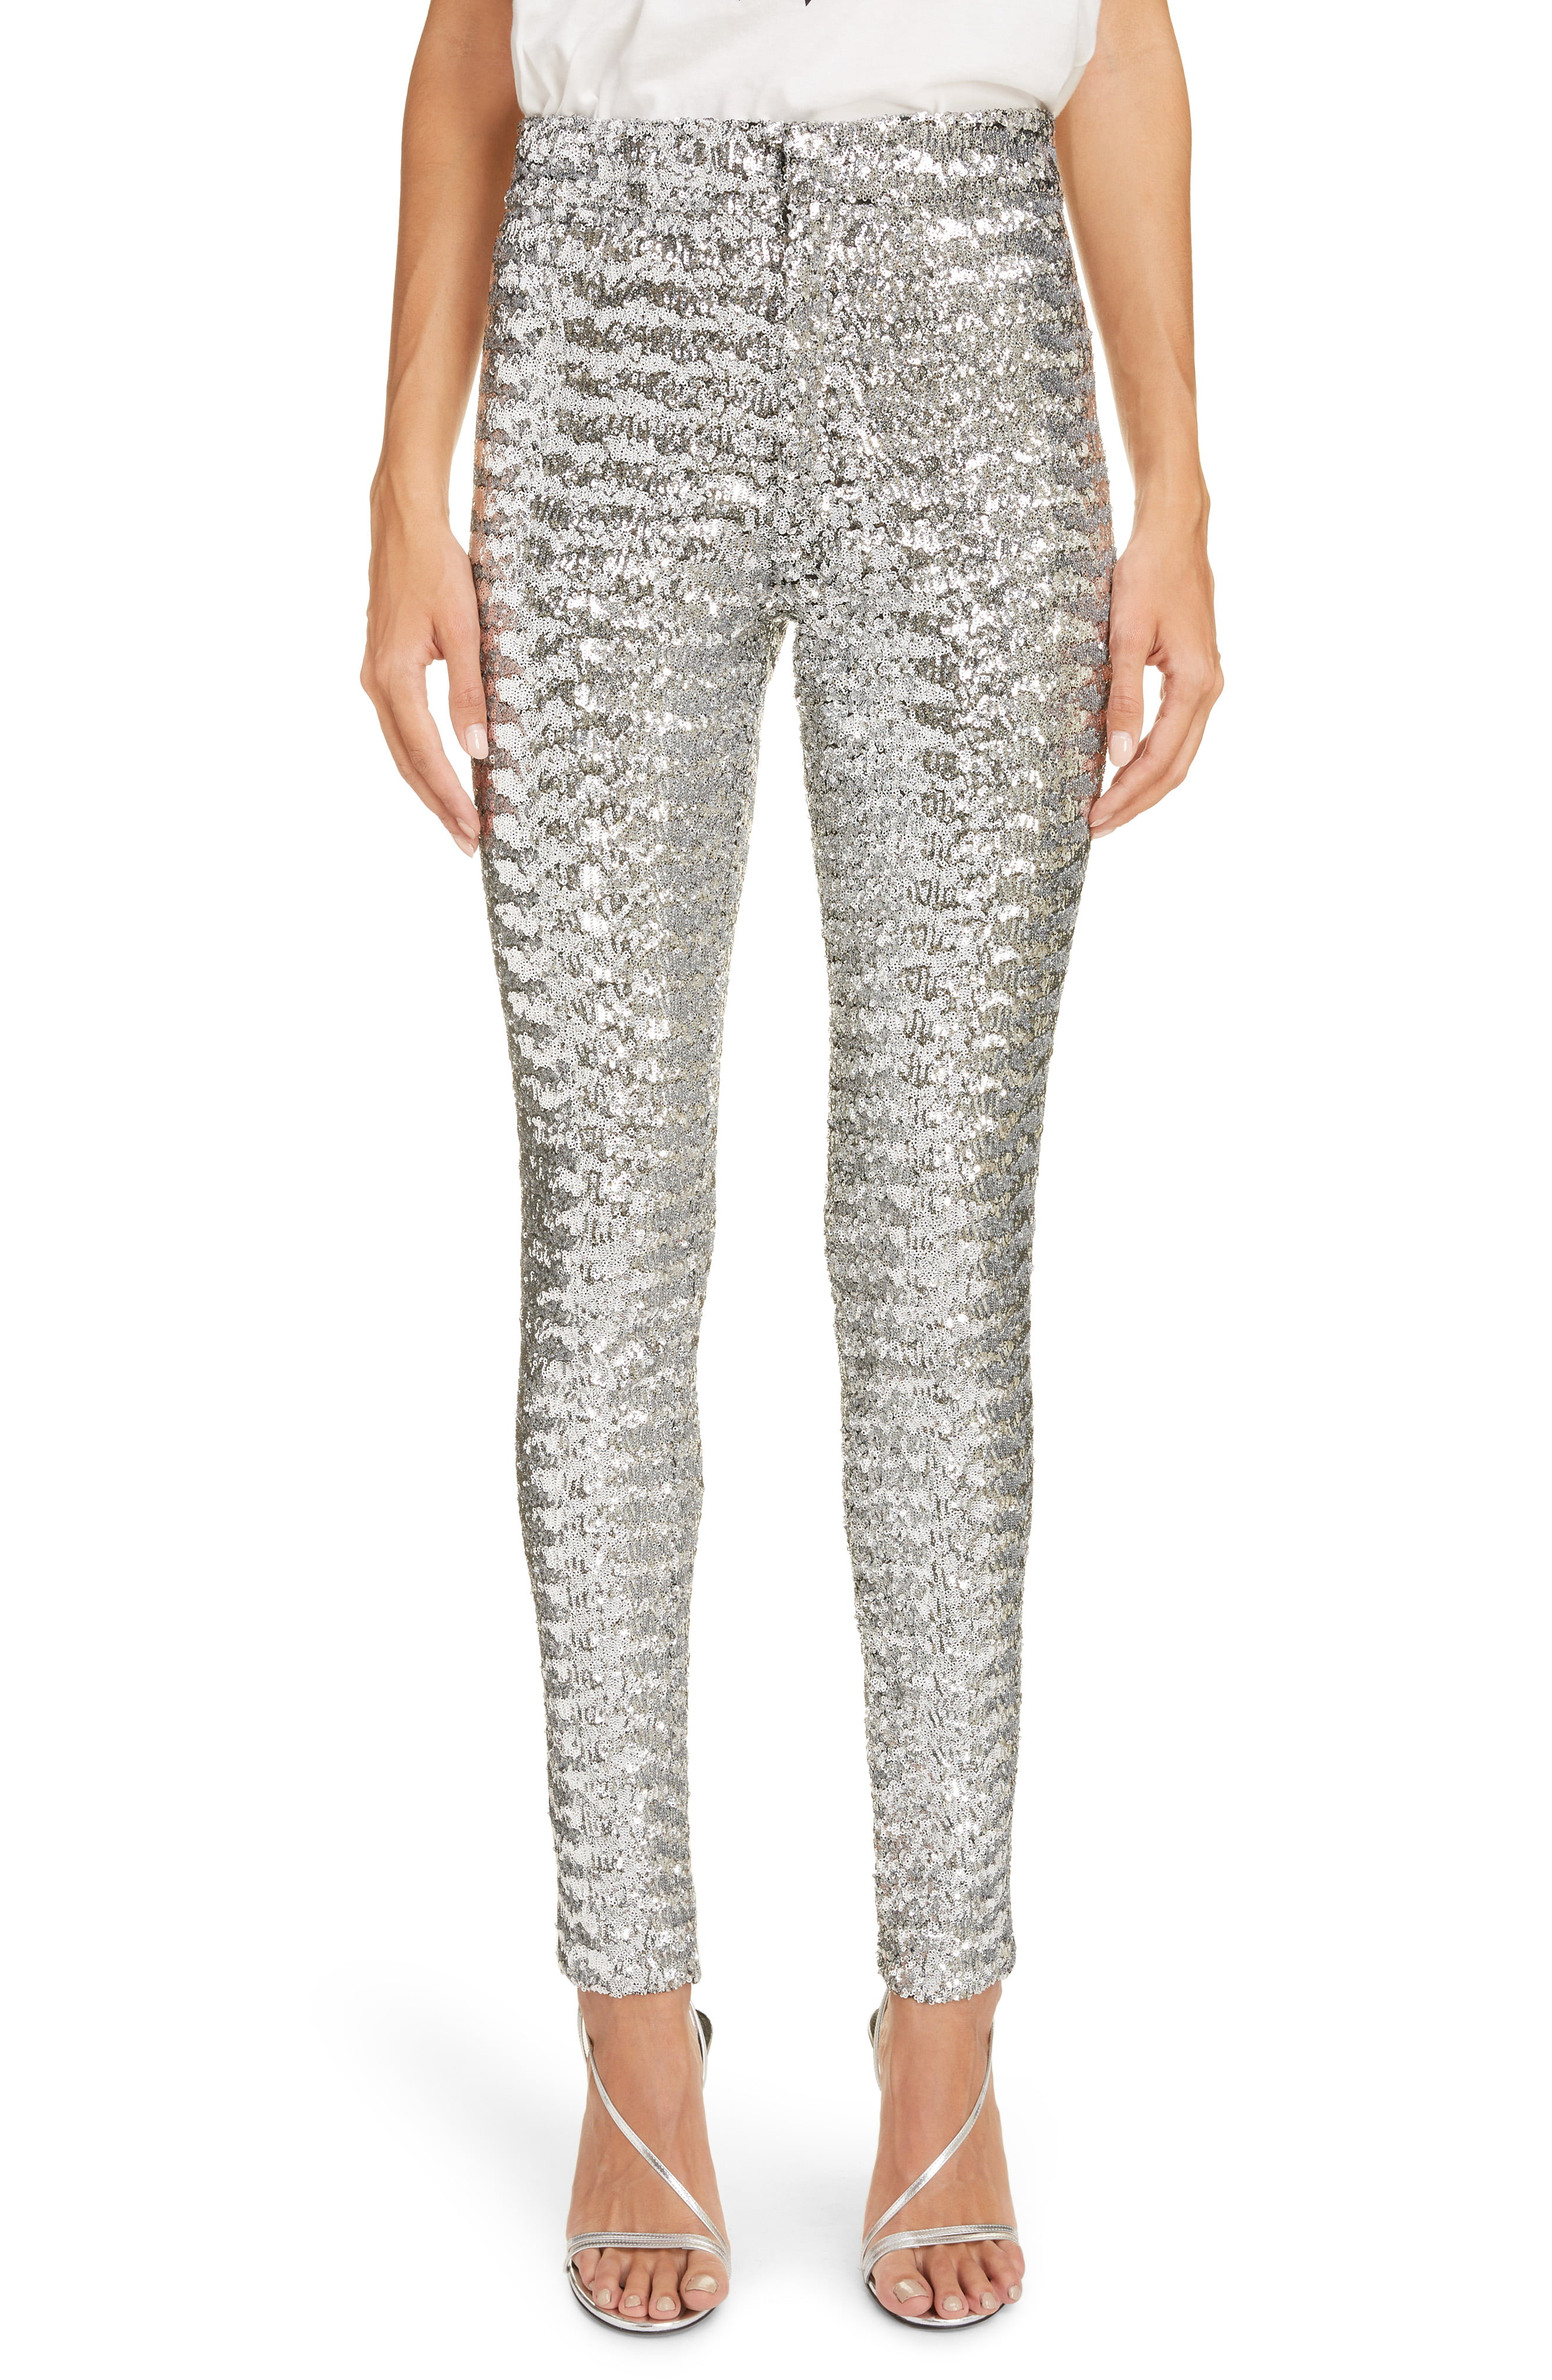 452ef9a29d Women's Isabel Marant Sequin Skinny Pants, Size 8 US / 40 FR - Metallic